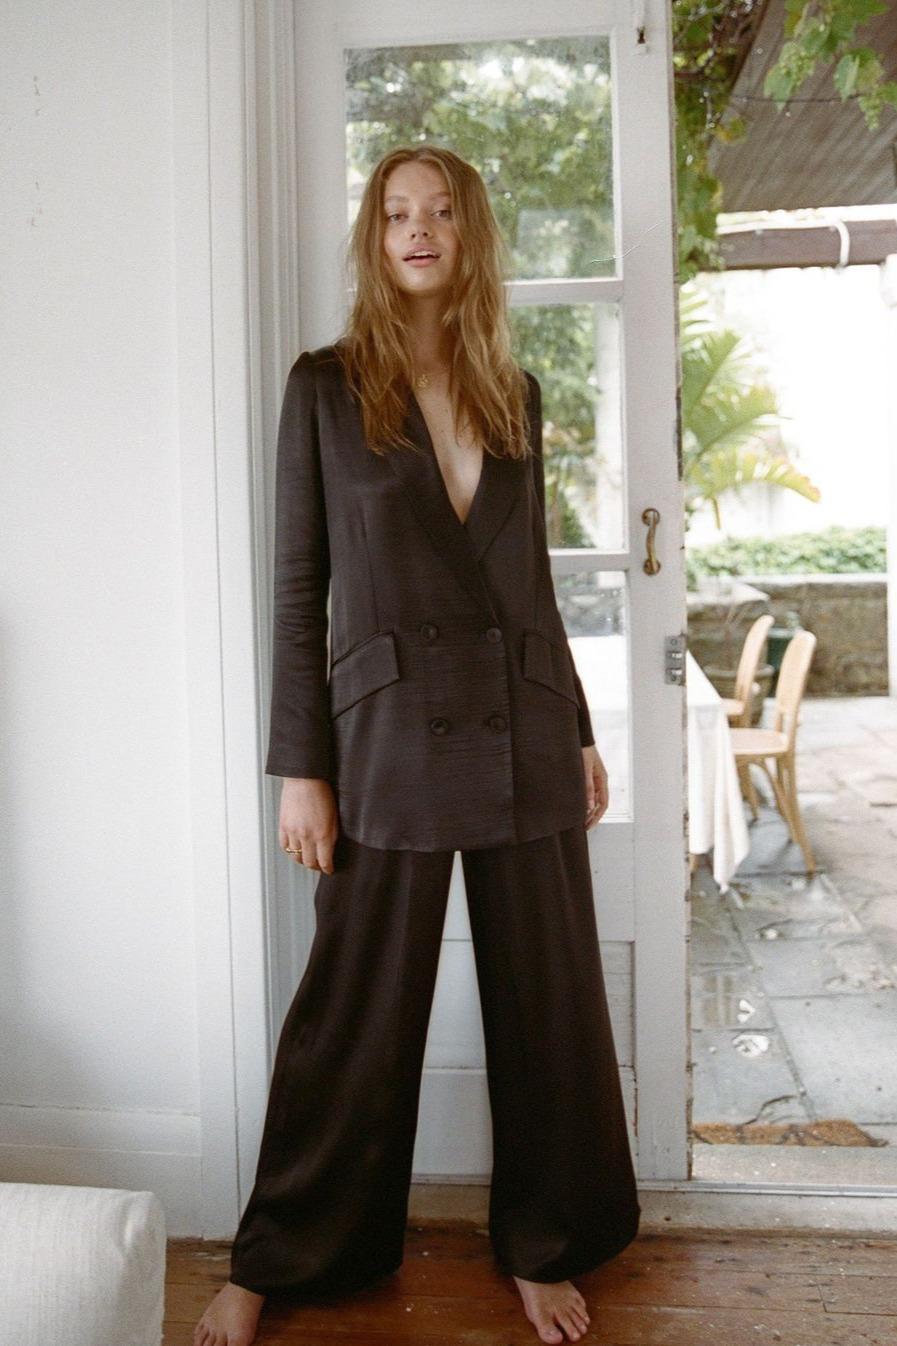 Tiahnee Skrijel for Shona Joy | Pride Models news